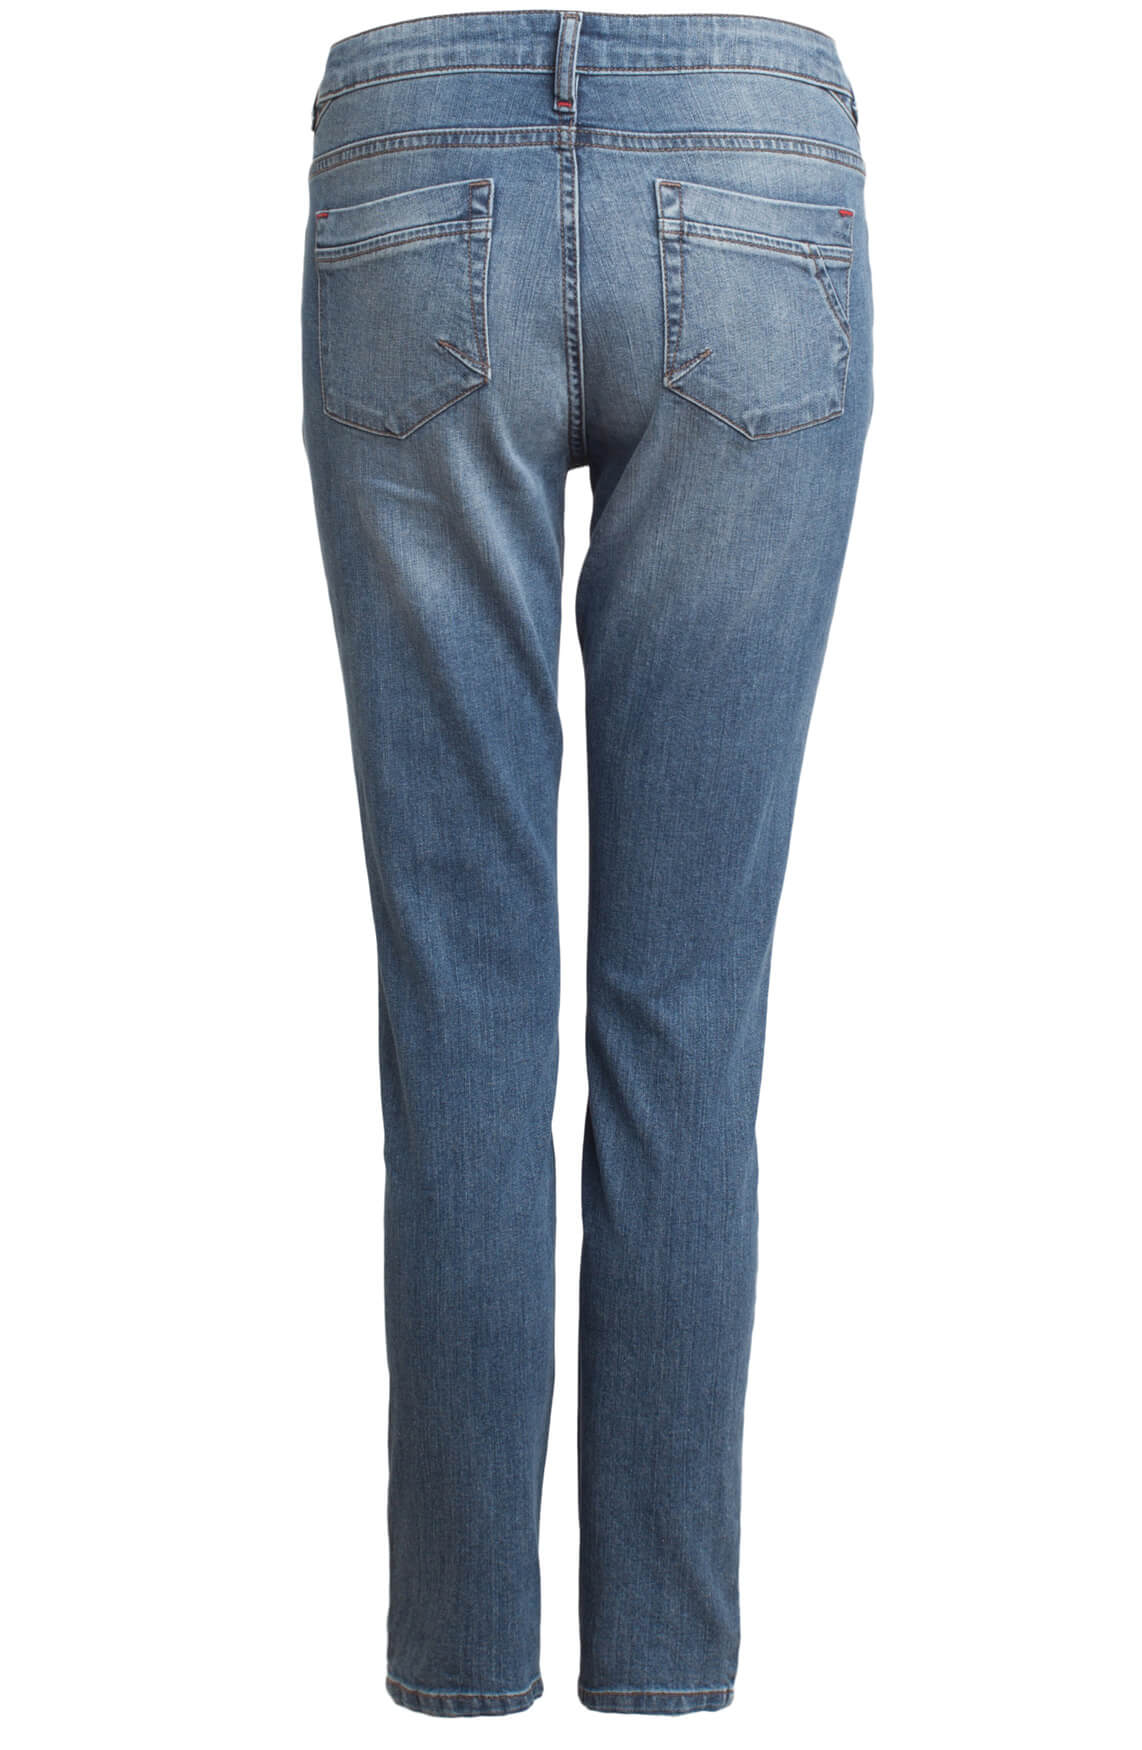 Anna Blue Dames Jeans met ritsen 0